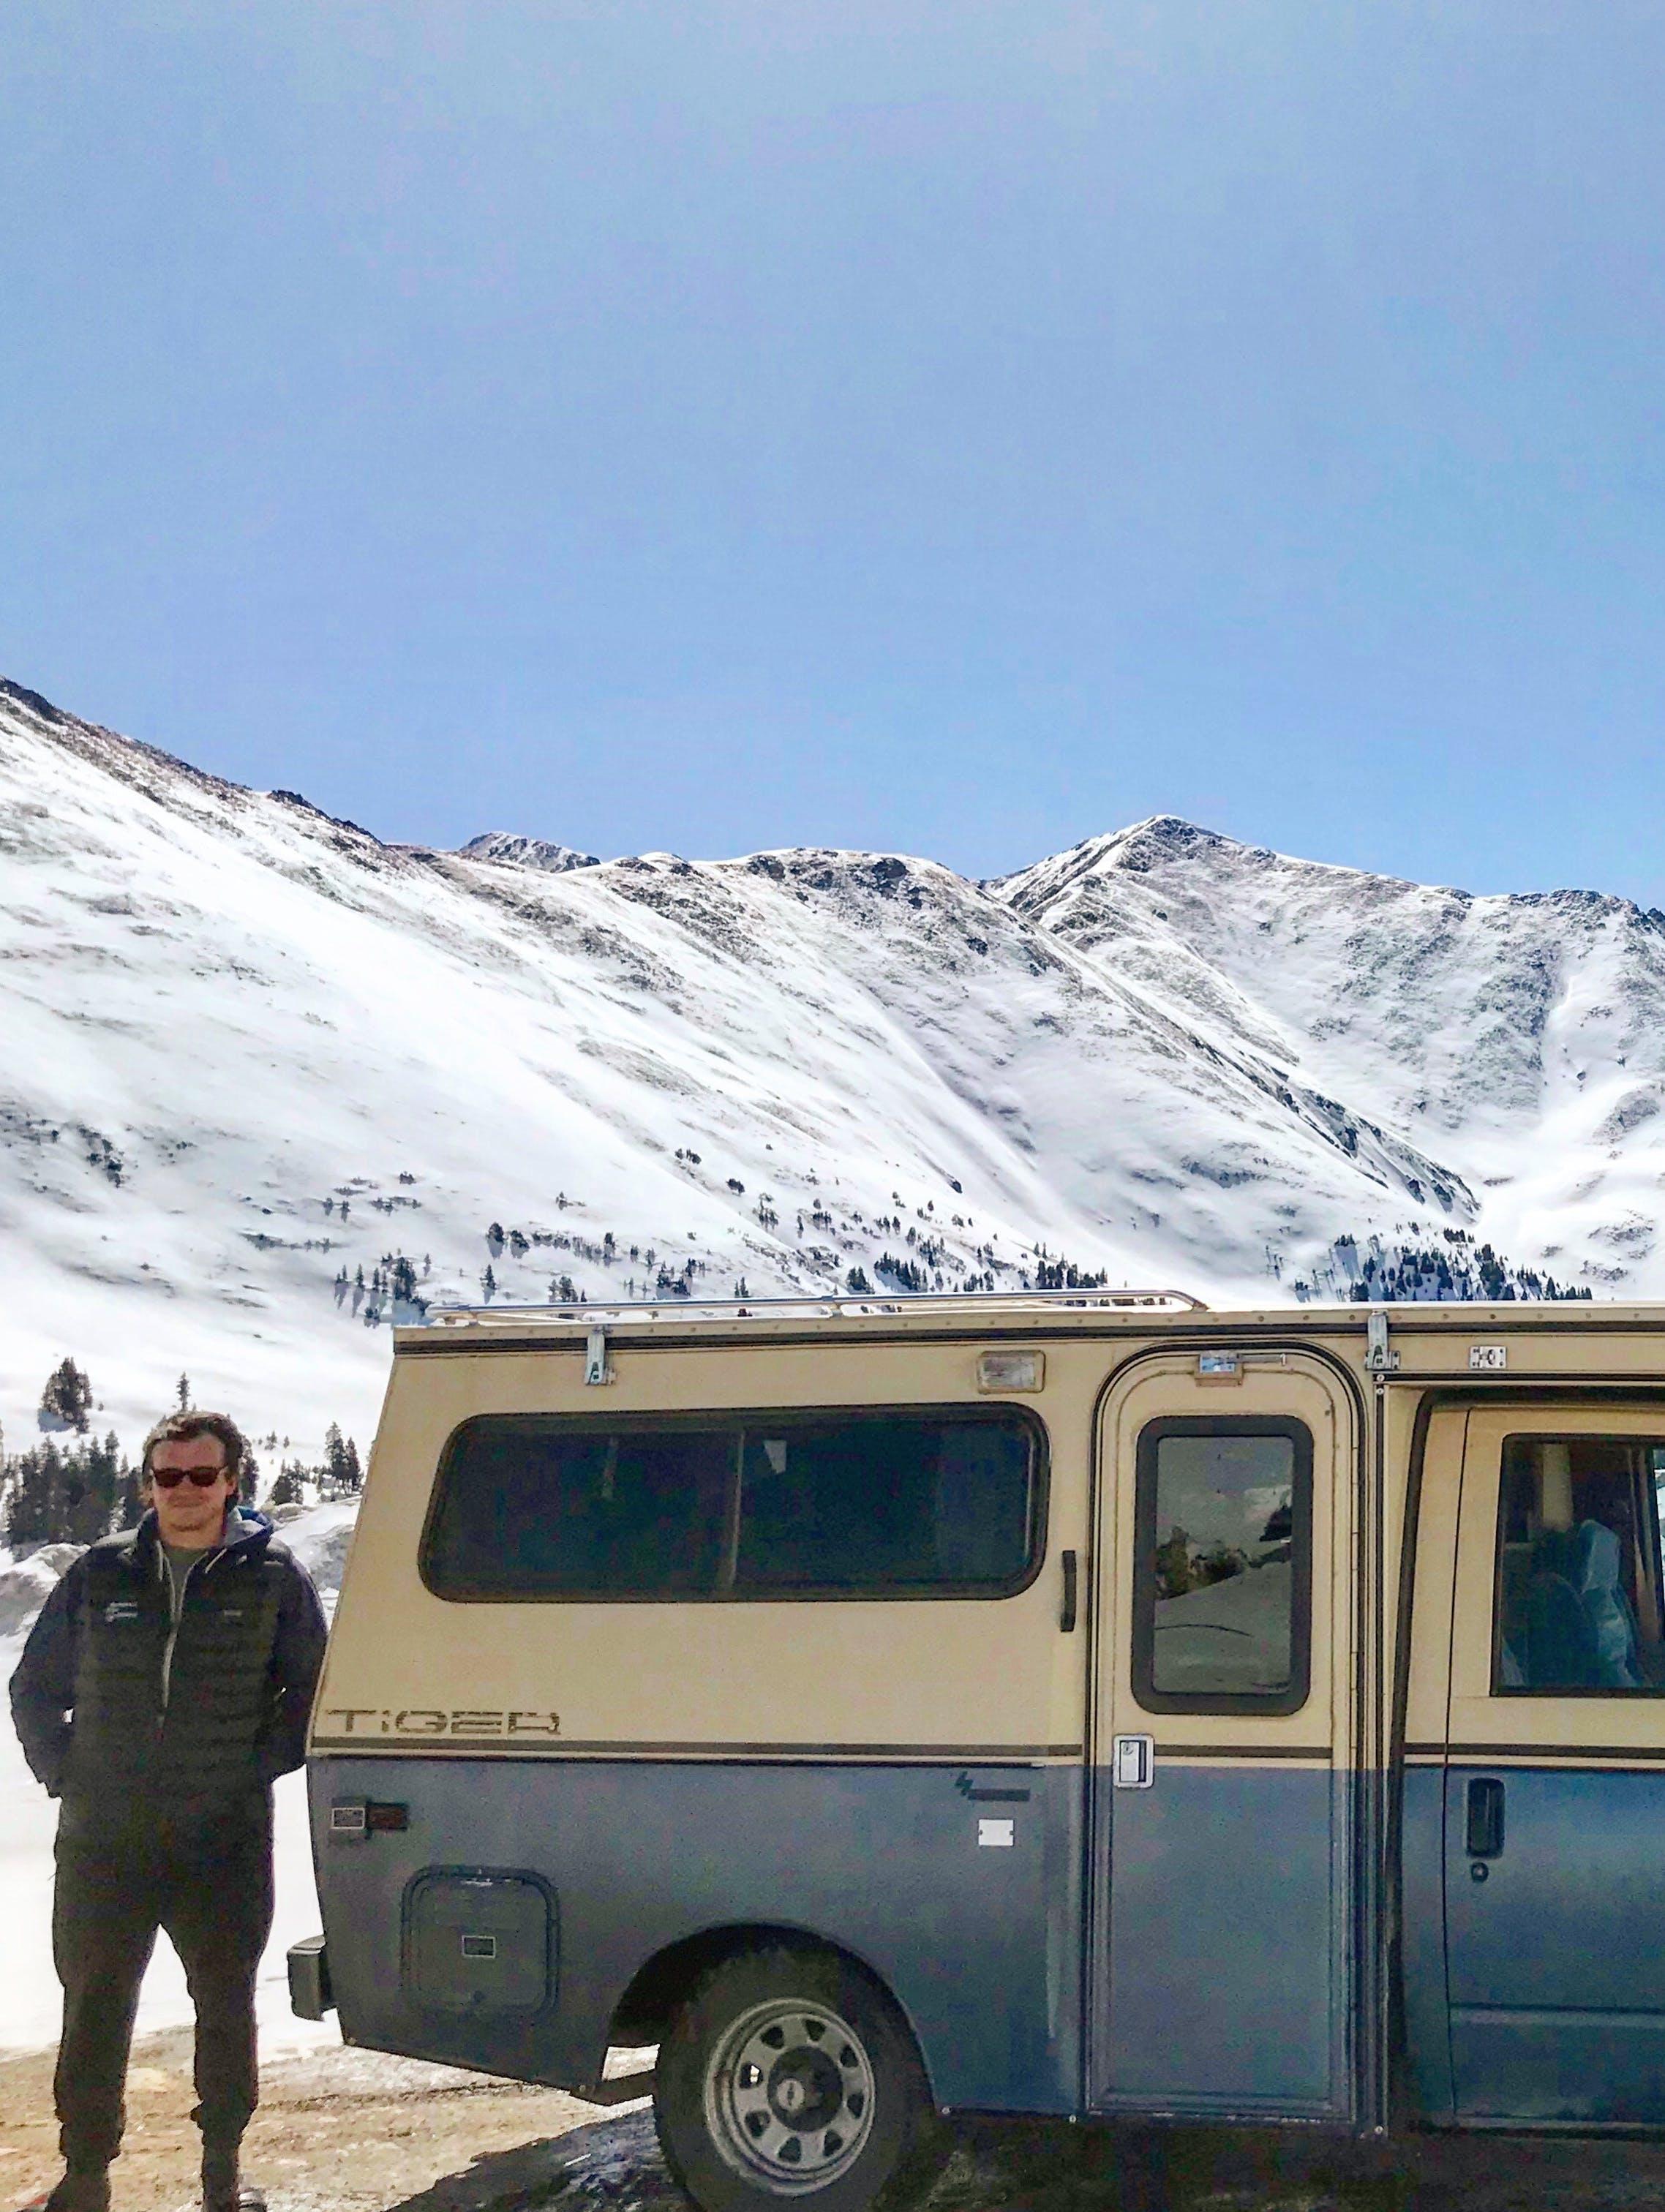 Snowboard Expert Andrew Wood